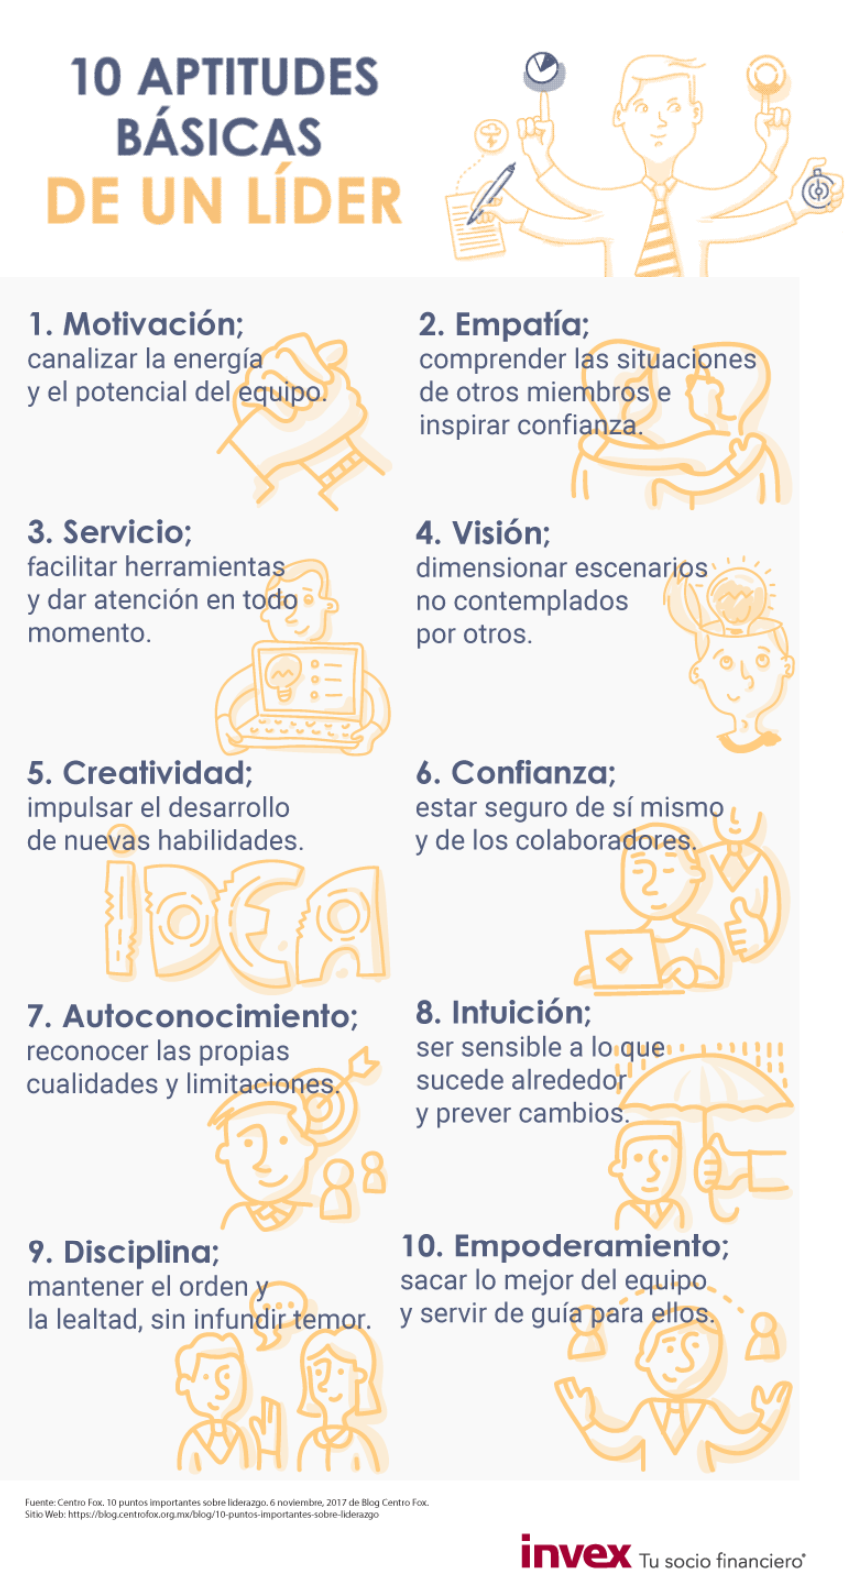 10 aptitudes básicas de un líder #infografia #infographic #leadership